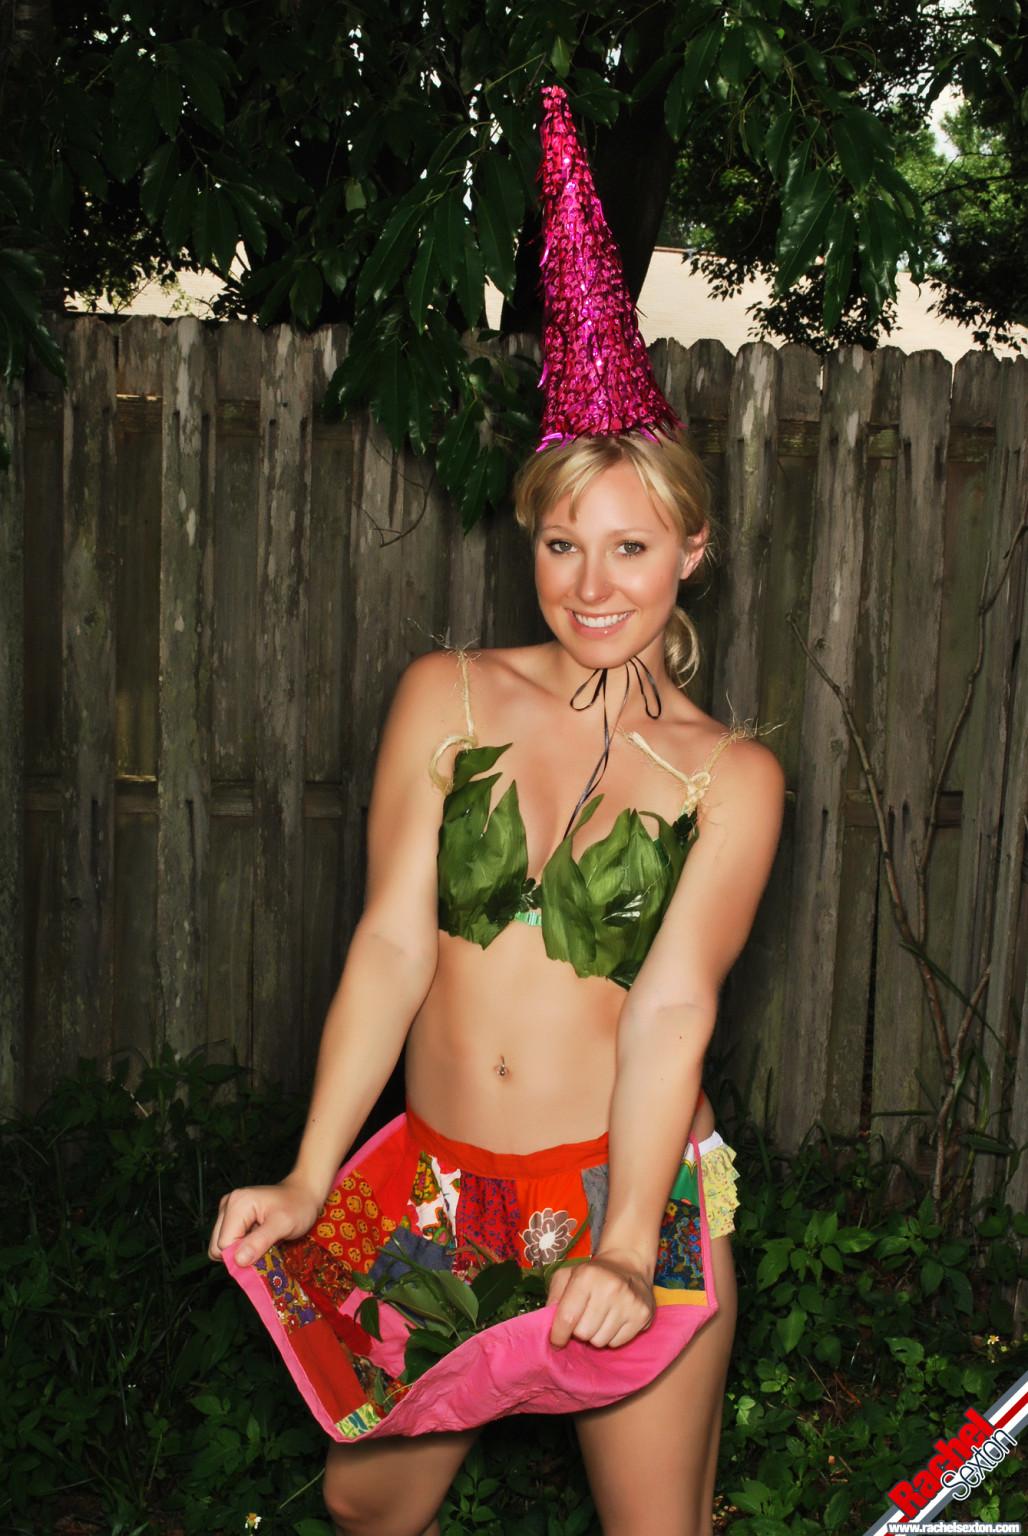 Rachel sexton is gnome alone erotic dancing in the yard